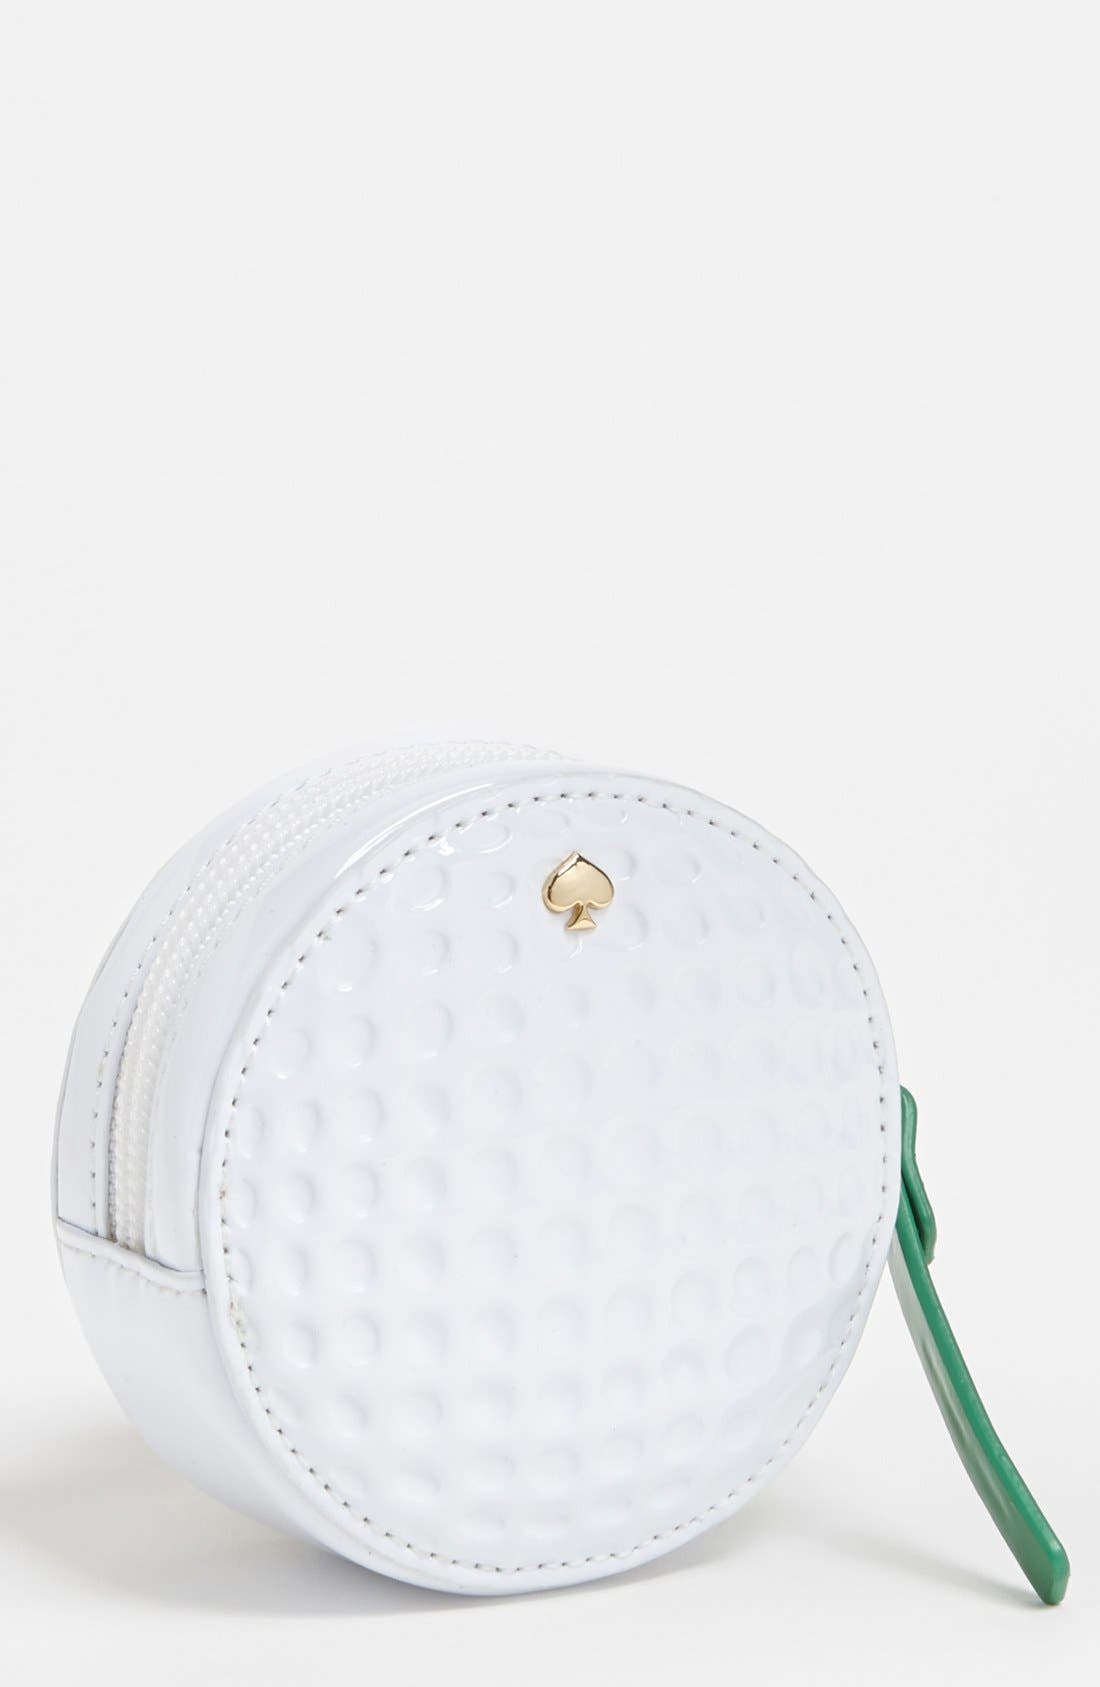 Alternate Image 1 Selected - kate spade new york 'golf ball' coin purse